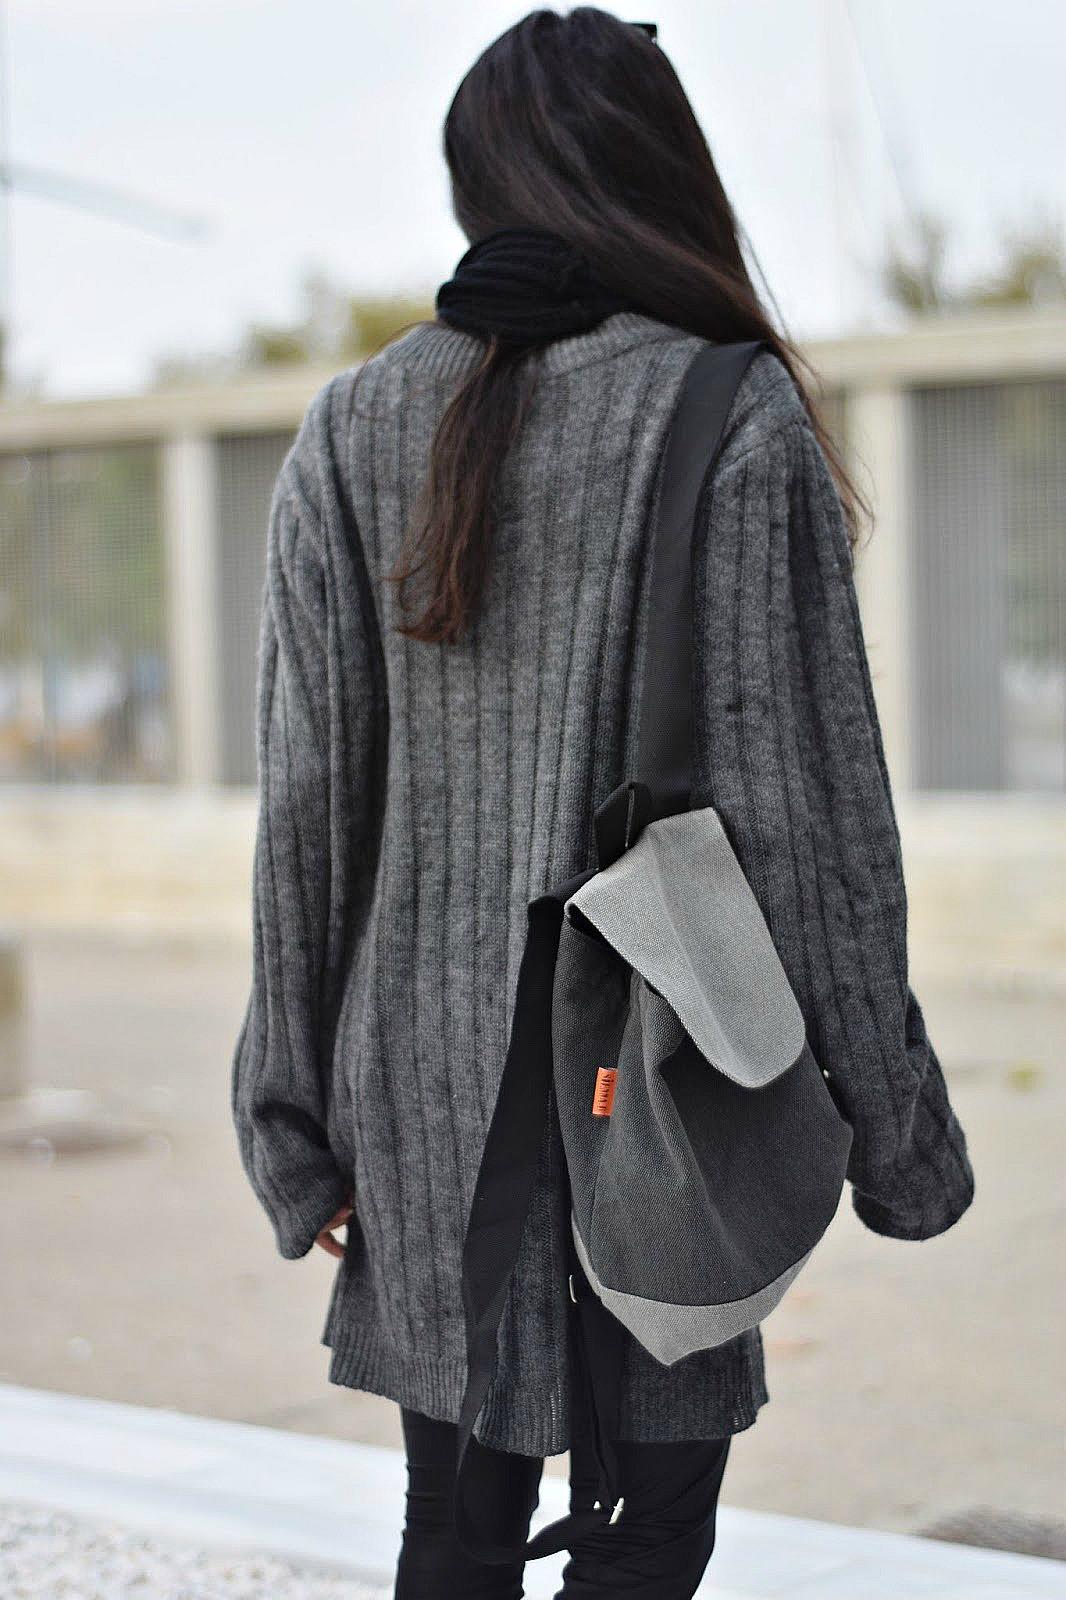 k-meets-style shirtdress and blazer